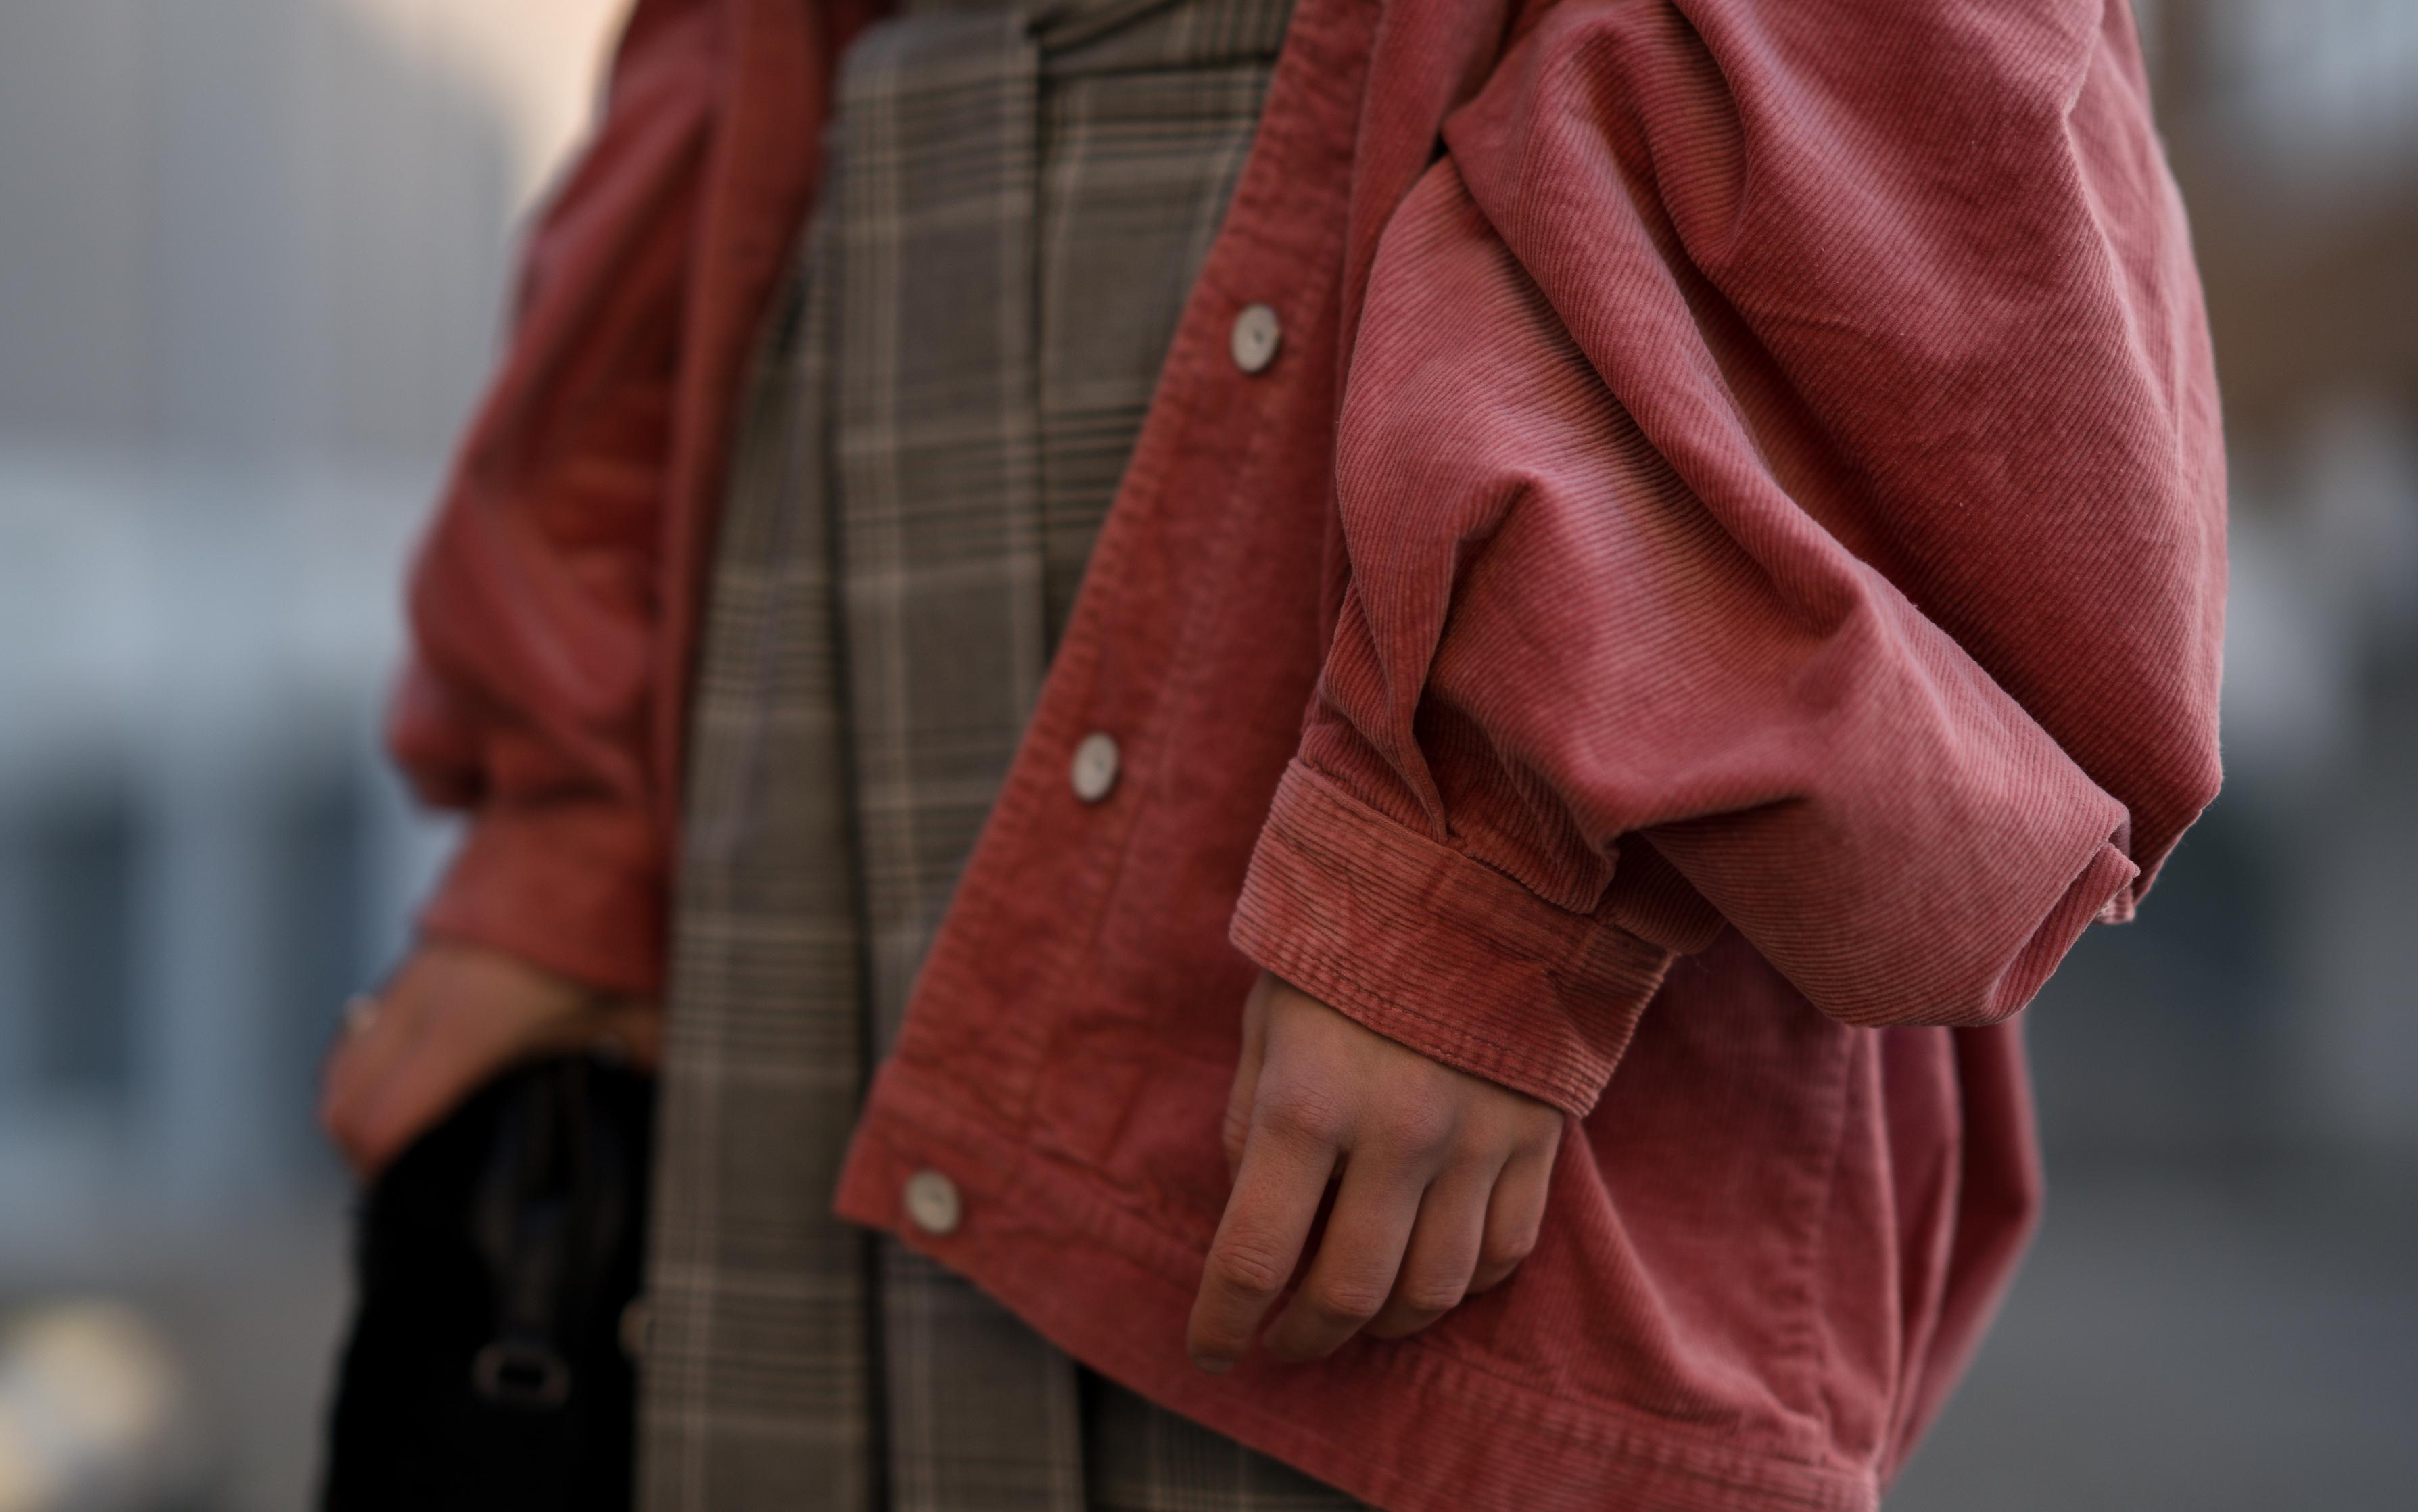 Pink Cord Jacket Glencheck Dress White Sneakers oversize Mango Cordjacke kariertes Kleid Zara Cord Trend Streetstyle Modeblog Sariety Fashionblogger Heidelberg_64